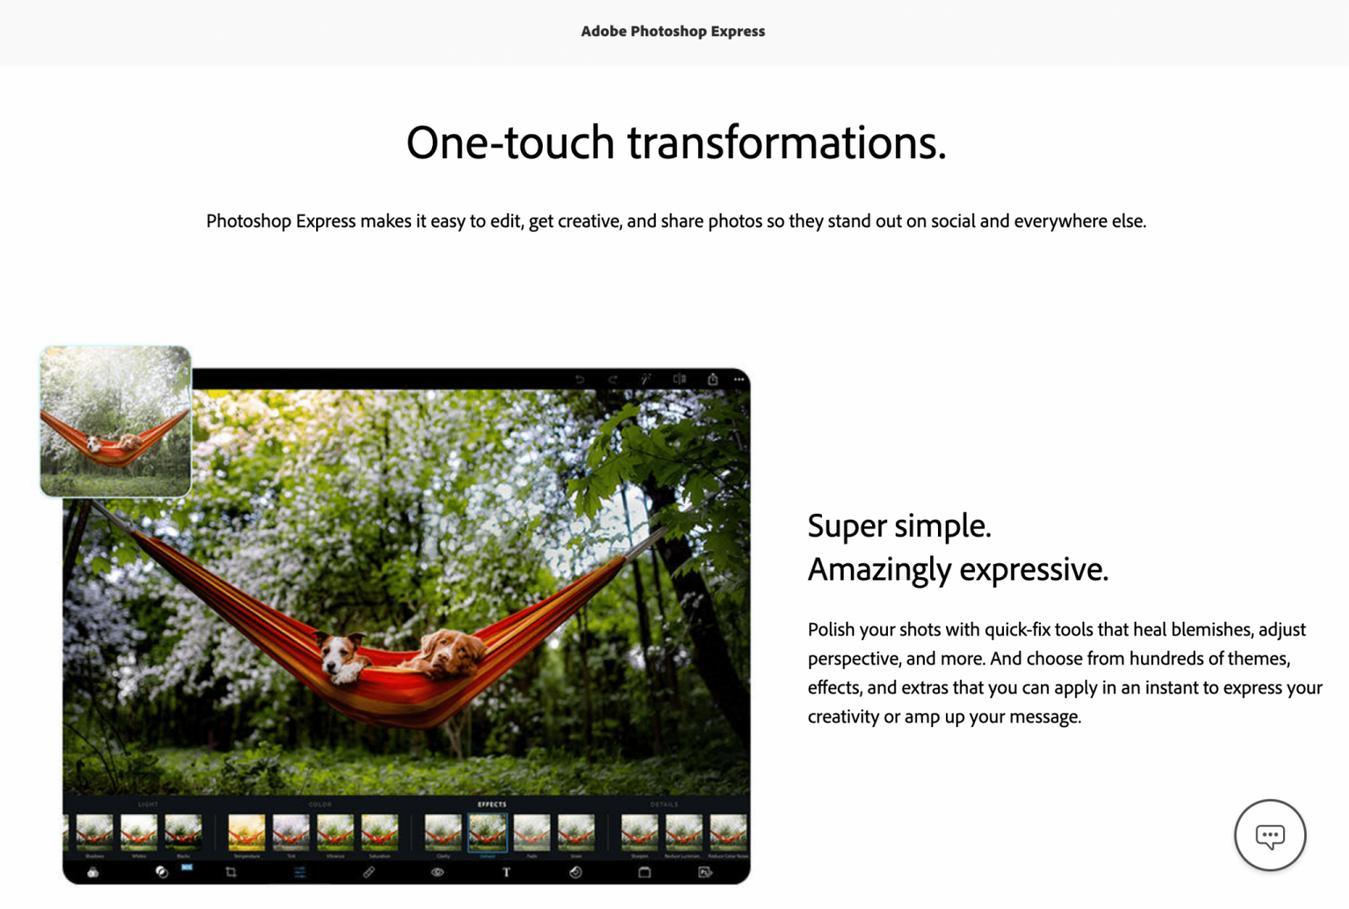 photoshop express landing page